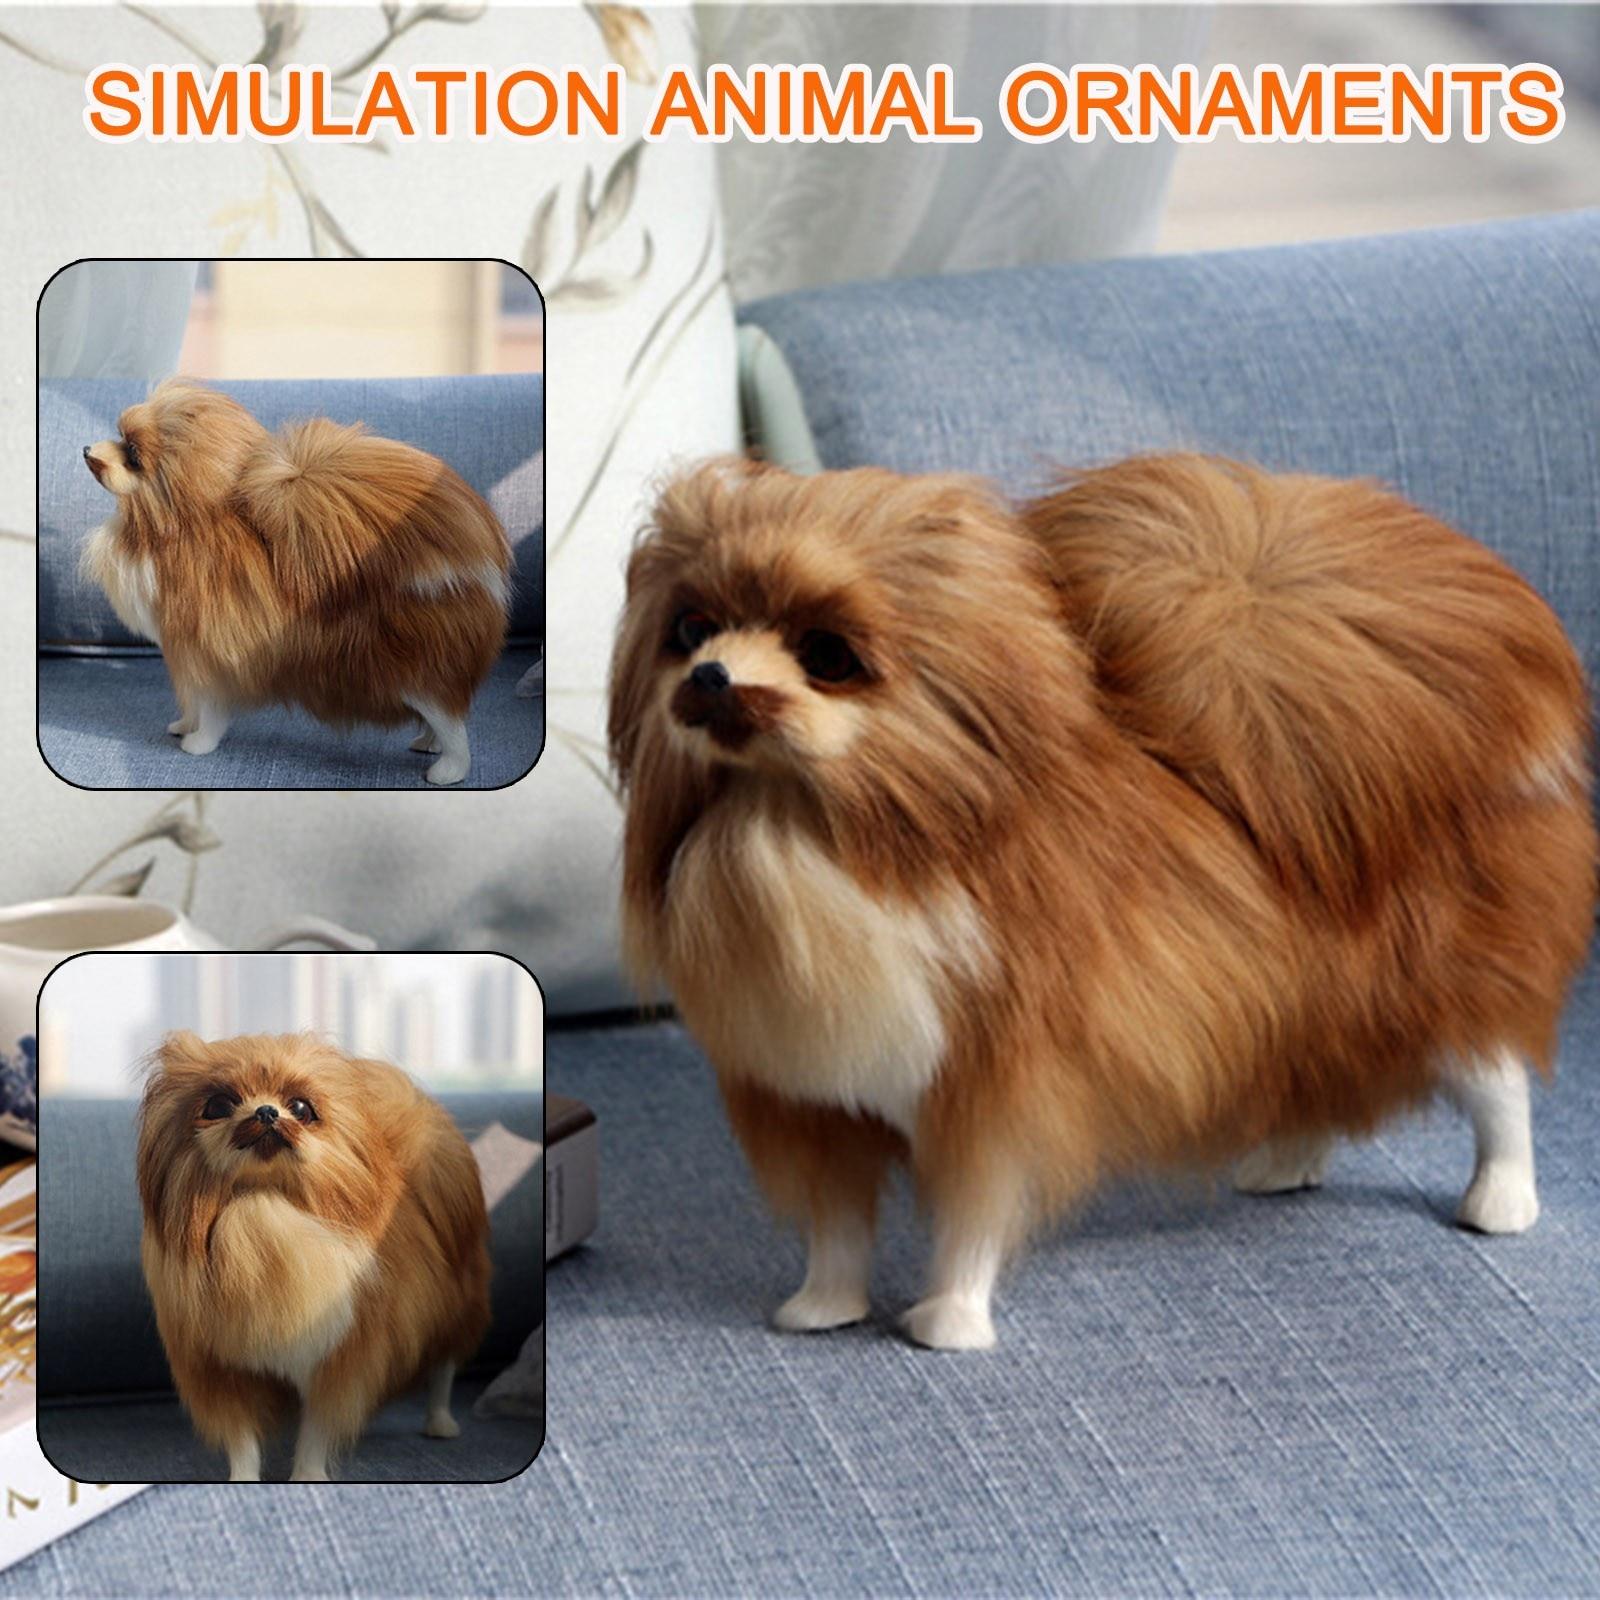 High Quality 3d Realistic Simulation Dog Toy Plush Pomeranian Toy Doll StufQWd Animal Kids Christmas Gift For Kids 22x7x19cm QW